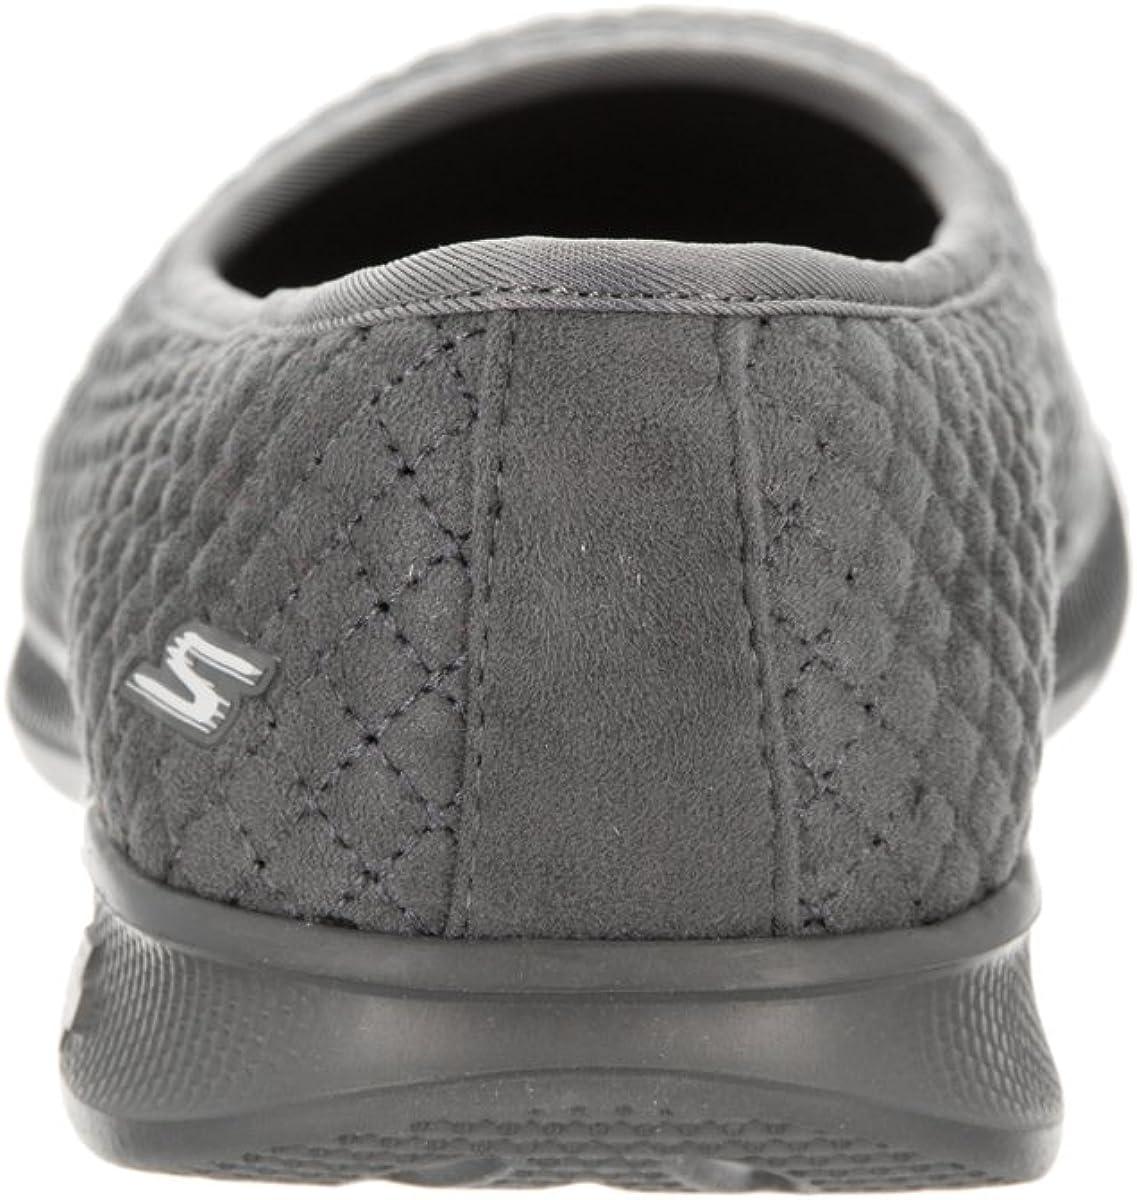 New Womens Skechers Go Step Lite Adored Shoe Style 14742 Black 81E pr